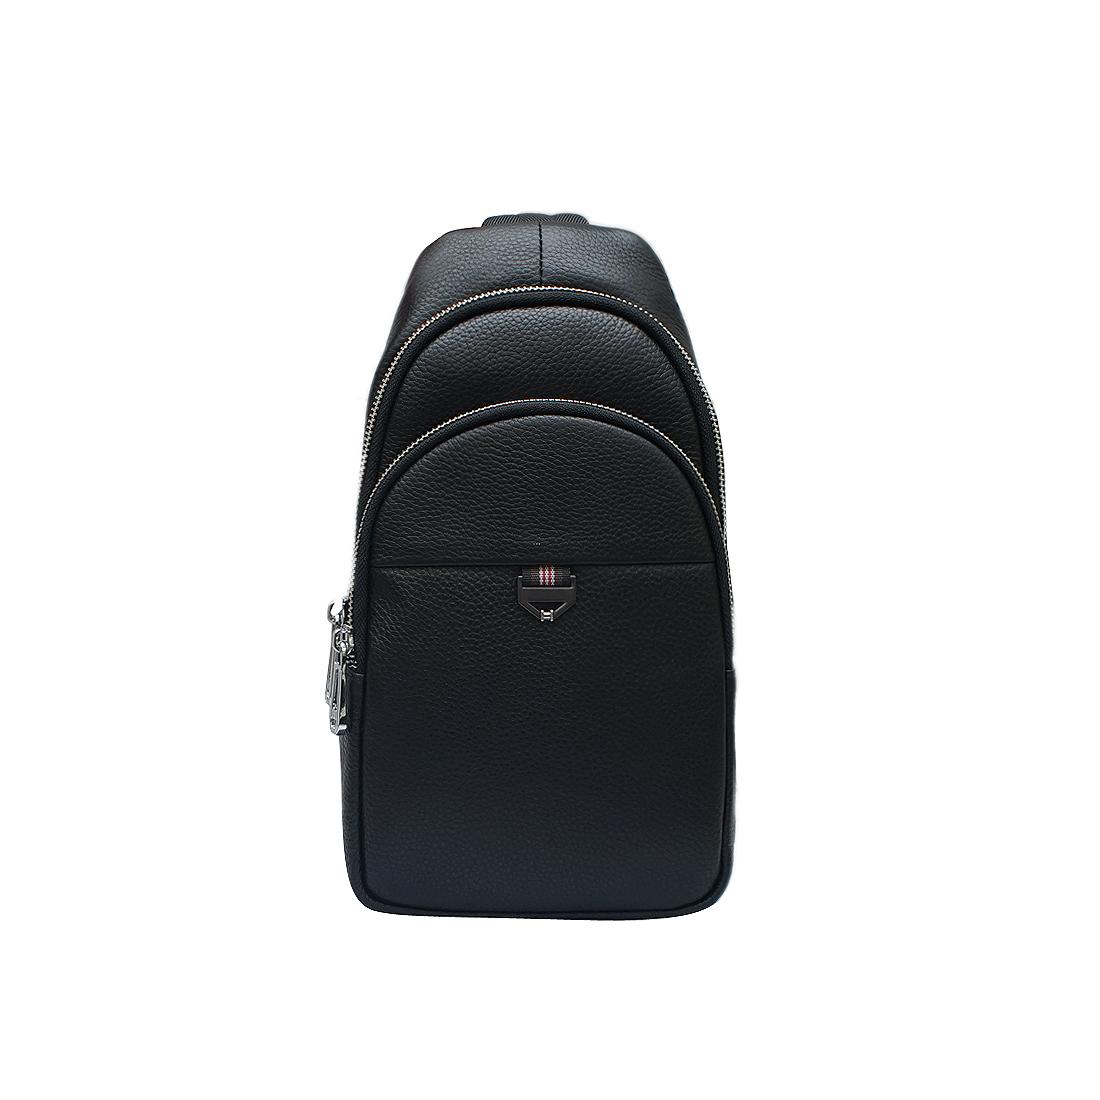 Túi đeo vai nam da bò thật cao cấp màu đen EB304